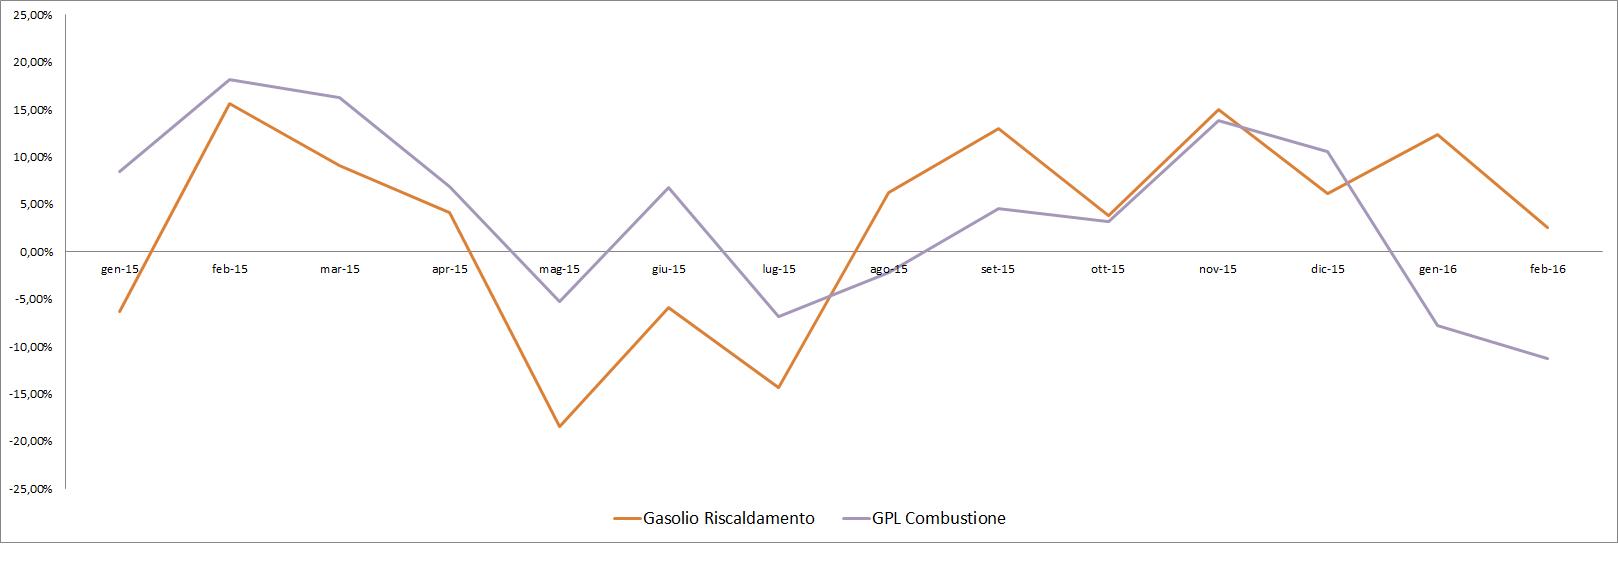 1_variazione anno precedente gasolio riscaldamento gpl